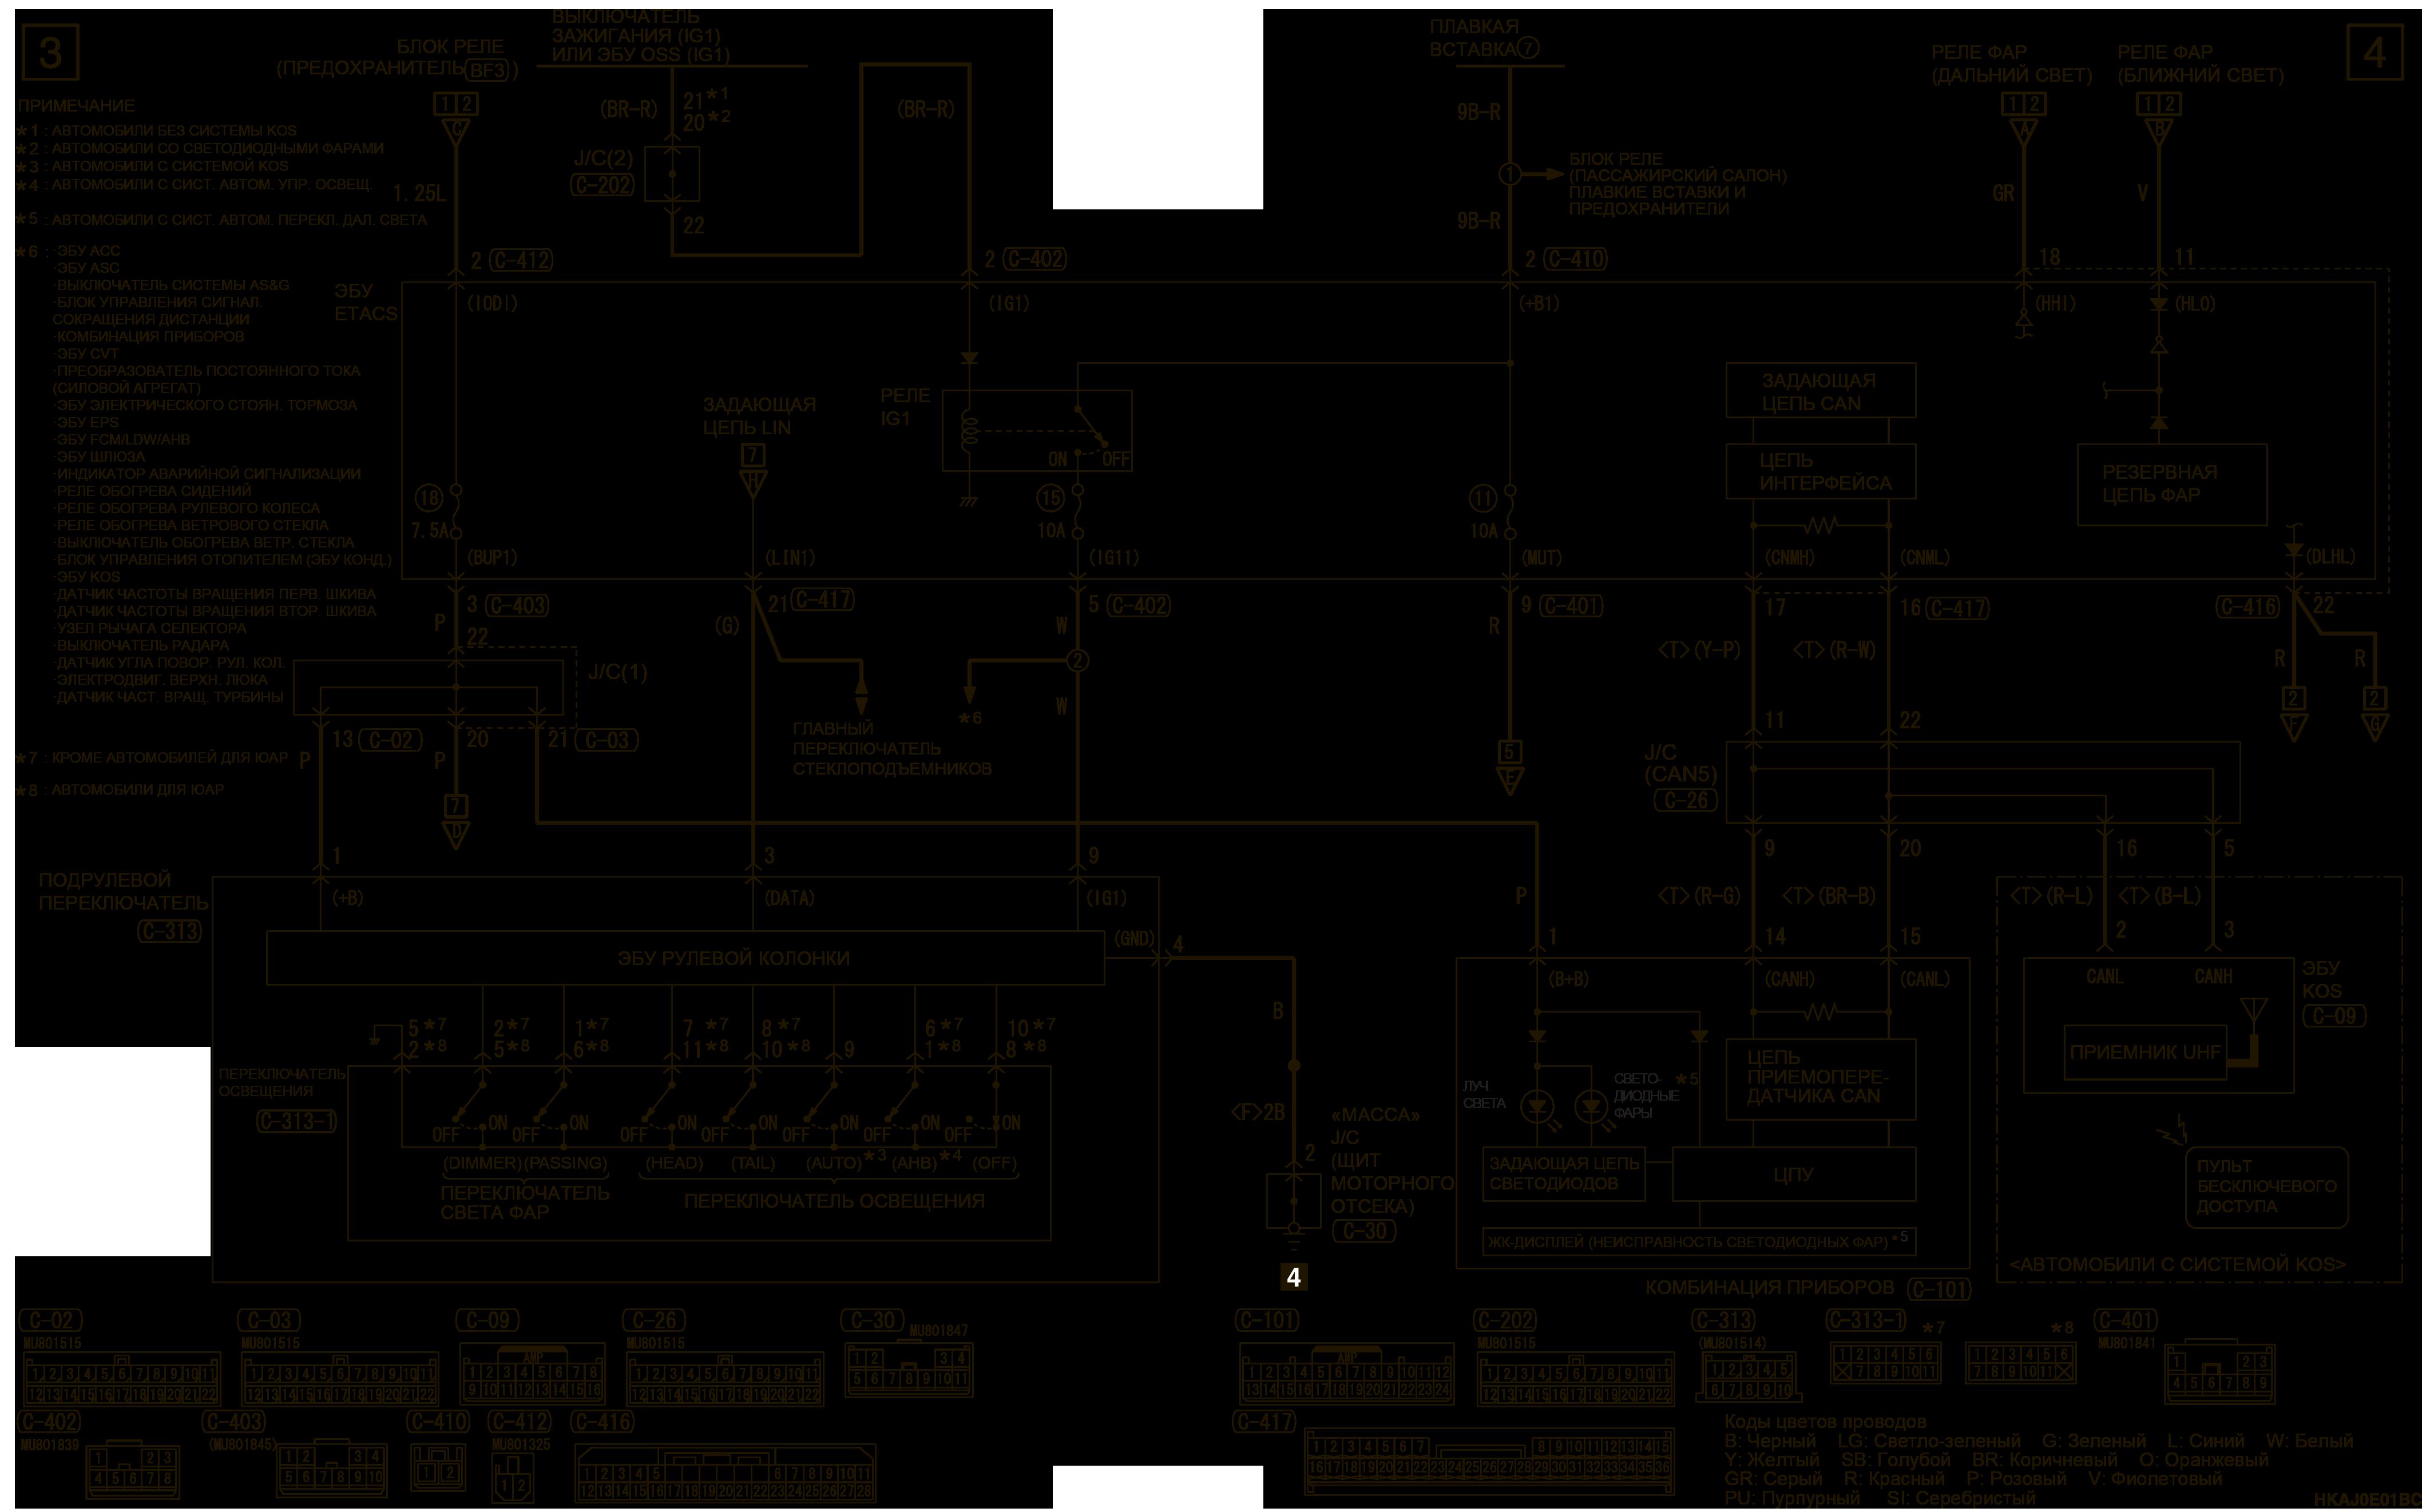 mmc аутлендер 3 2019 электросхемаФАРА  правая